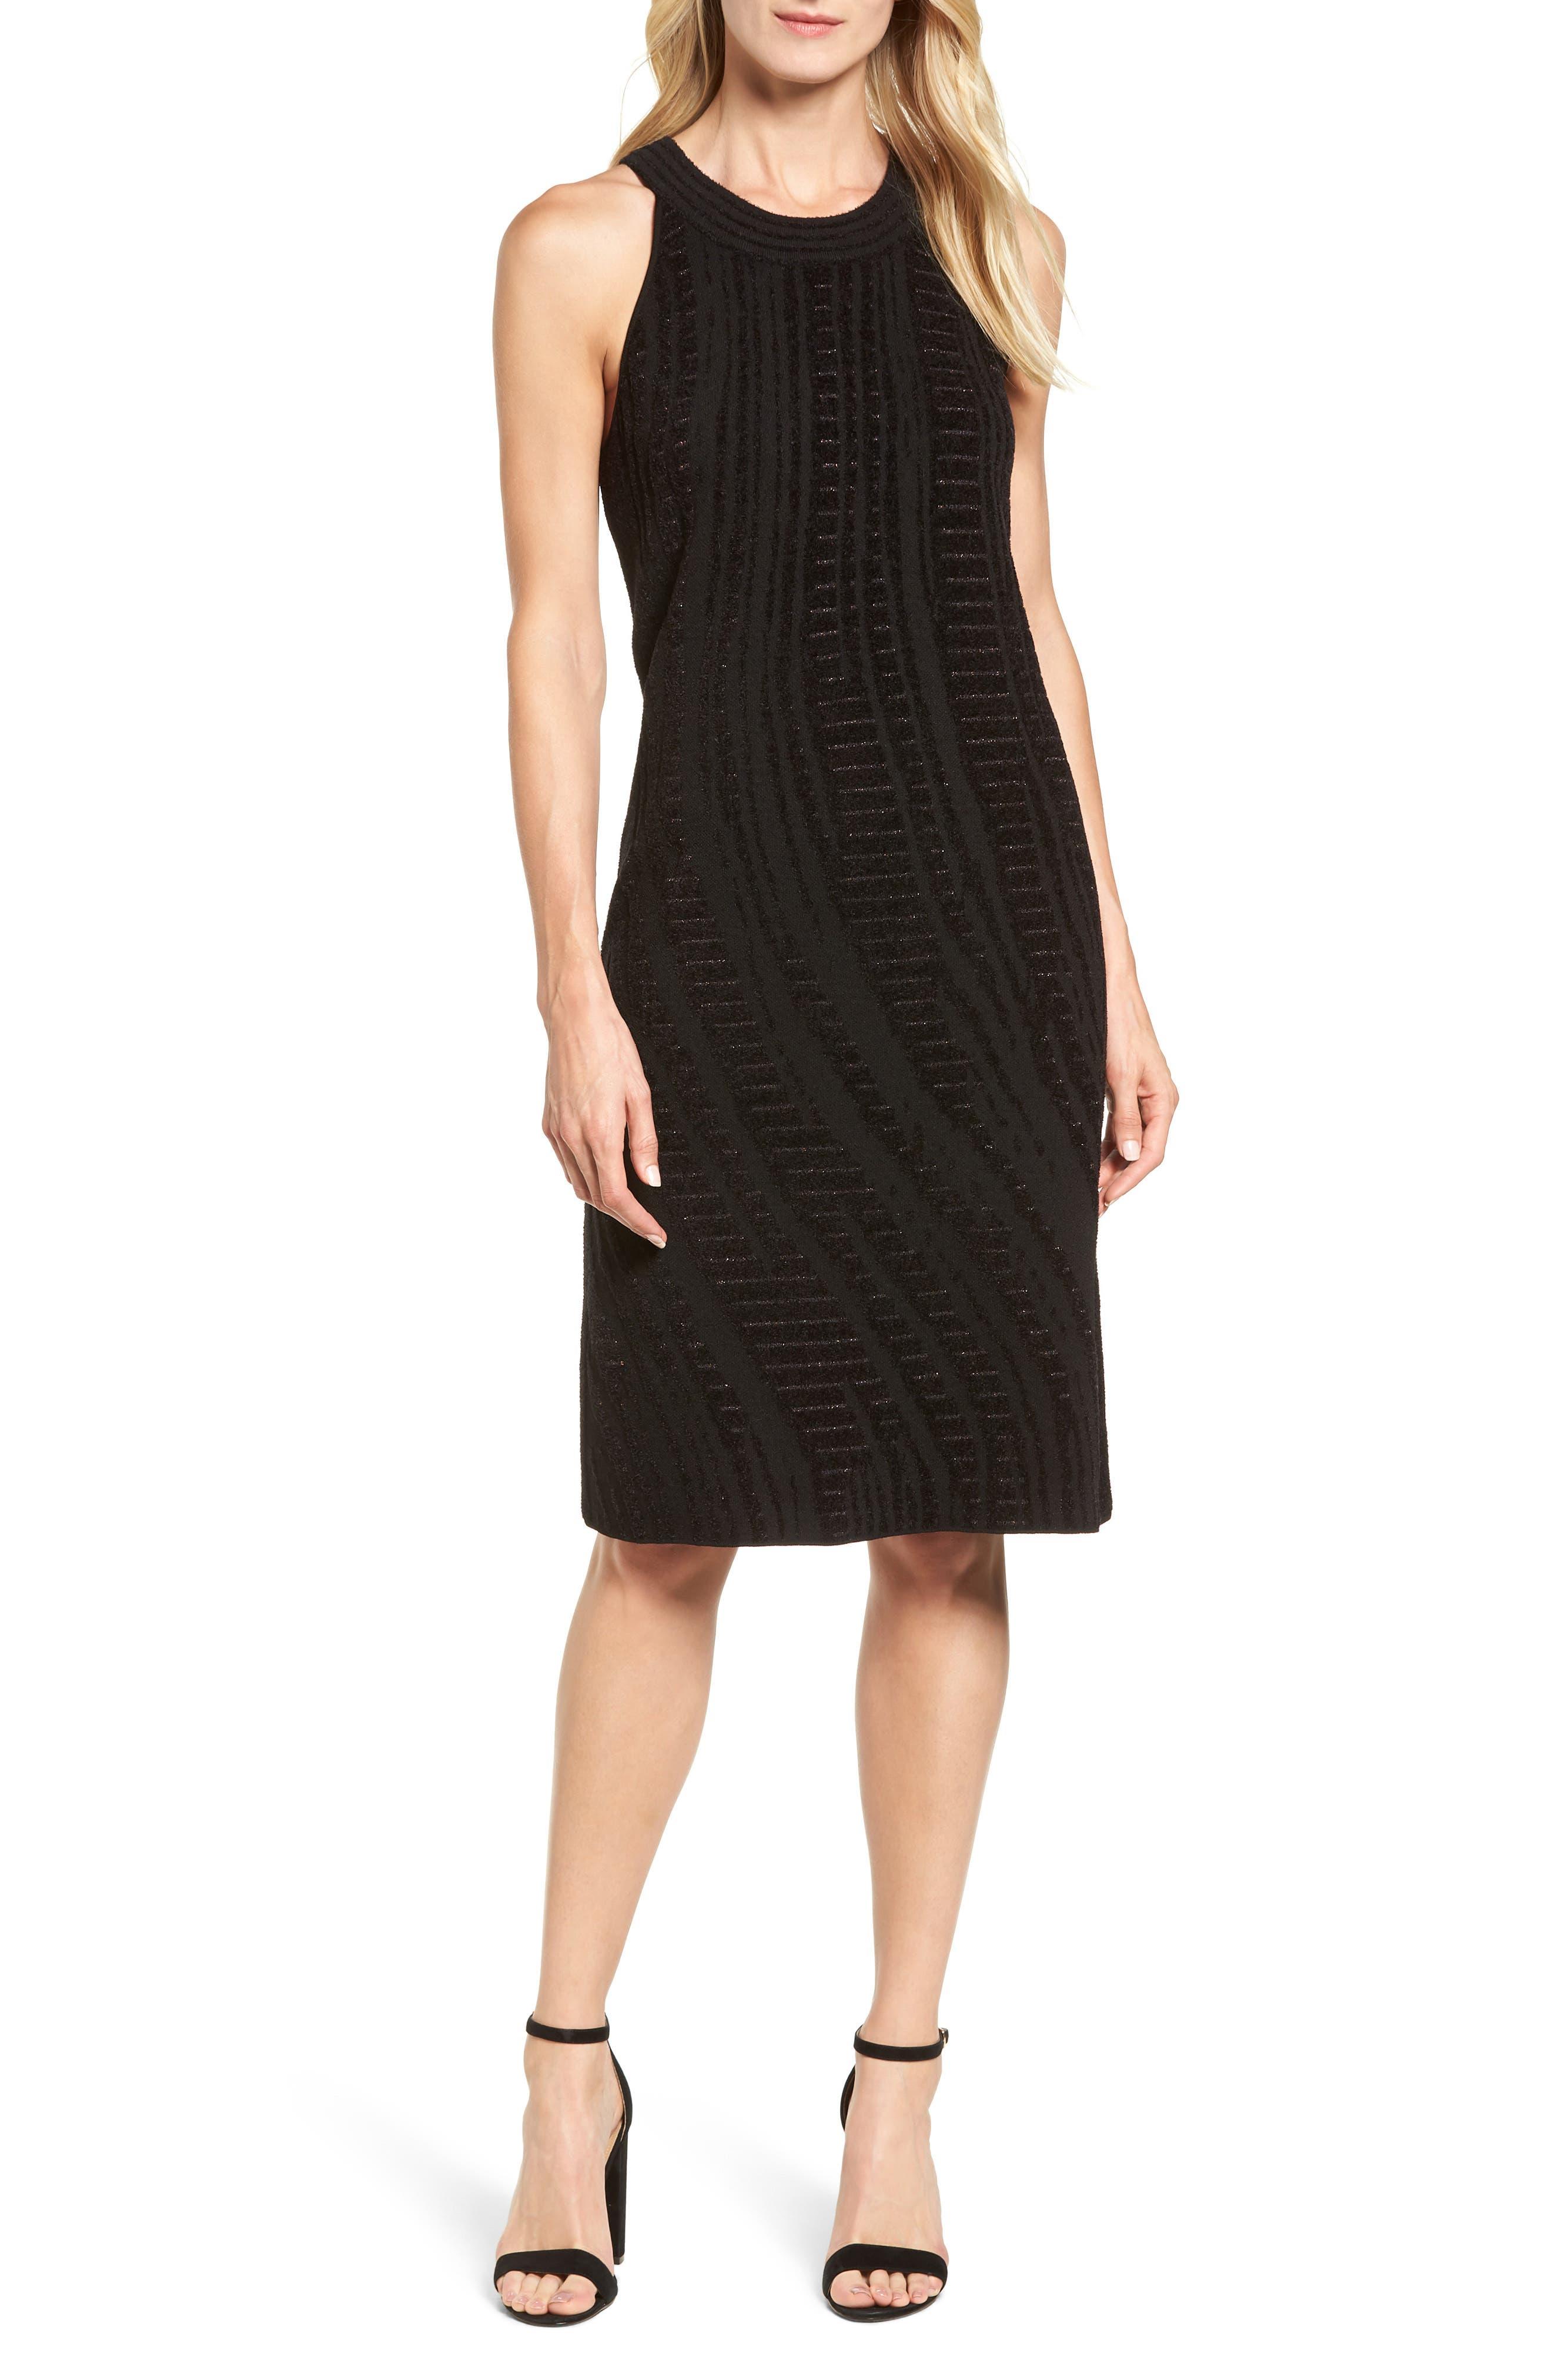 Winter Reign Dress,                         Main,                         color, Black Multi